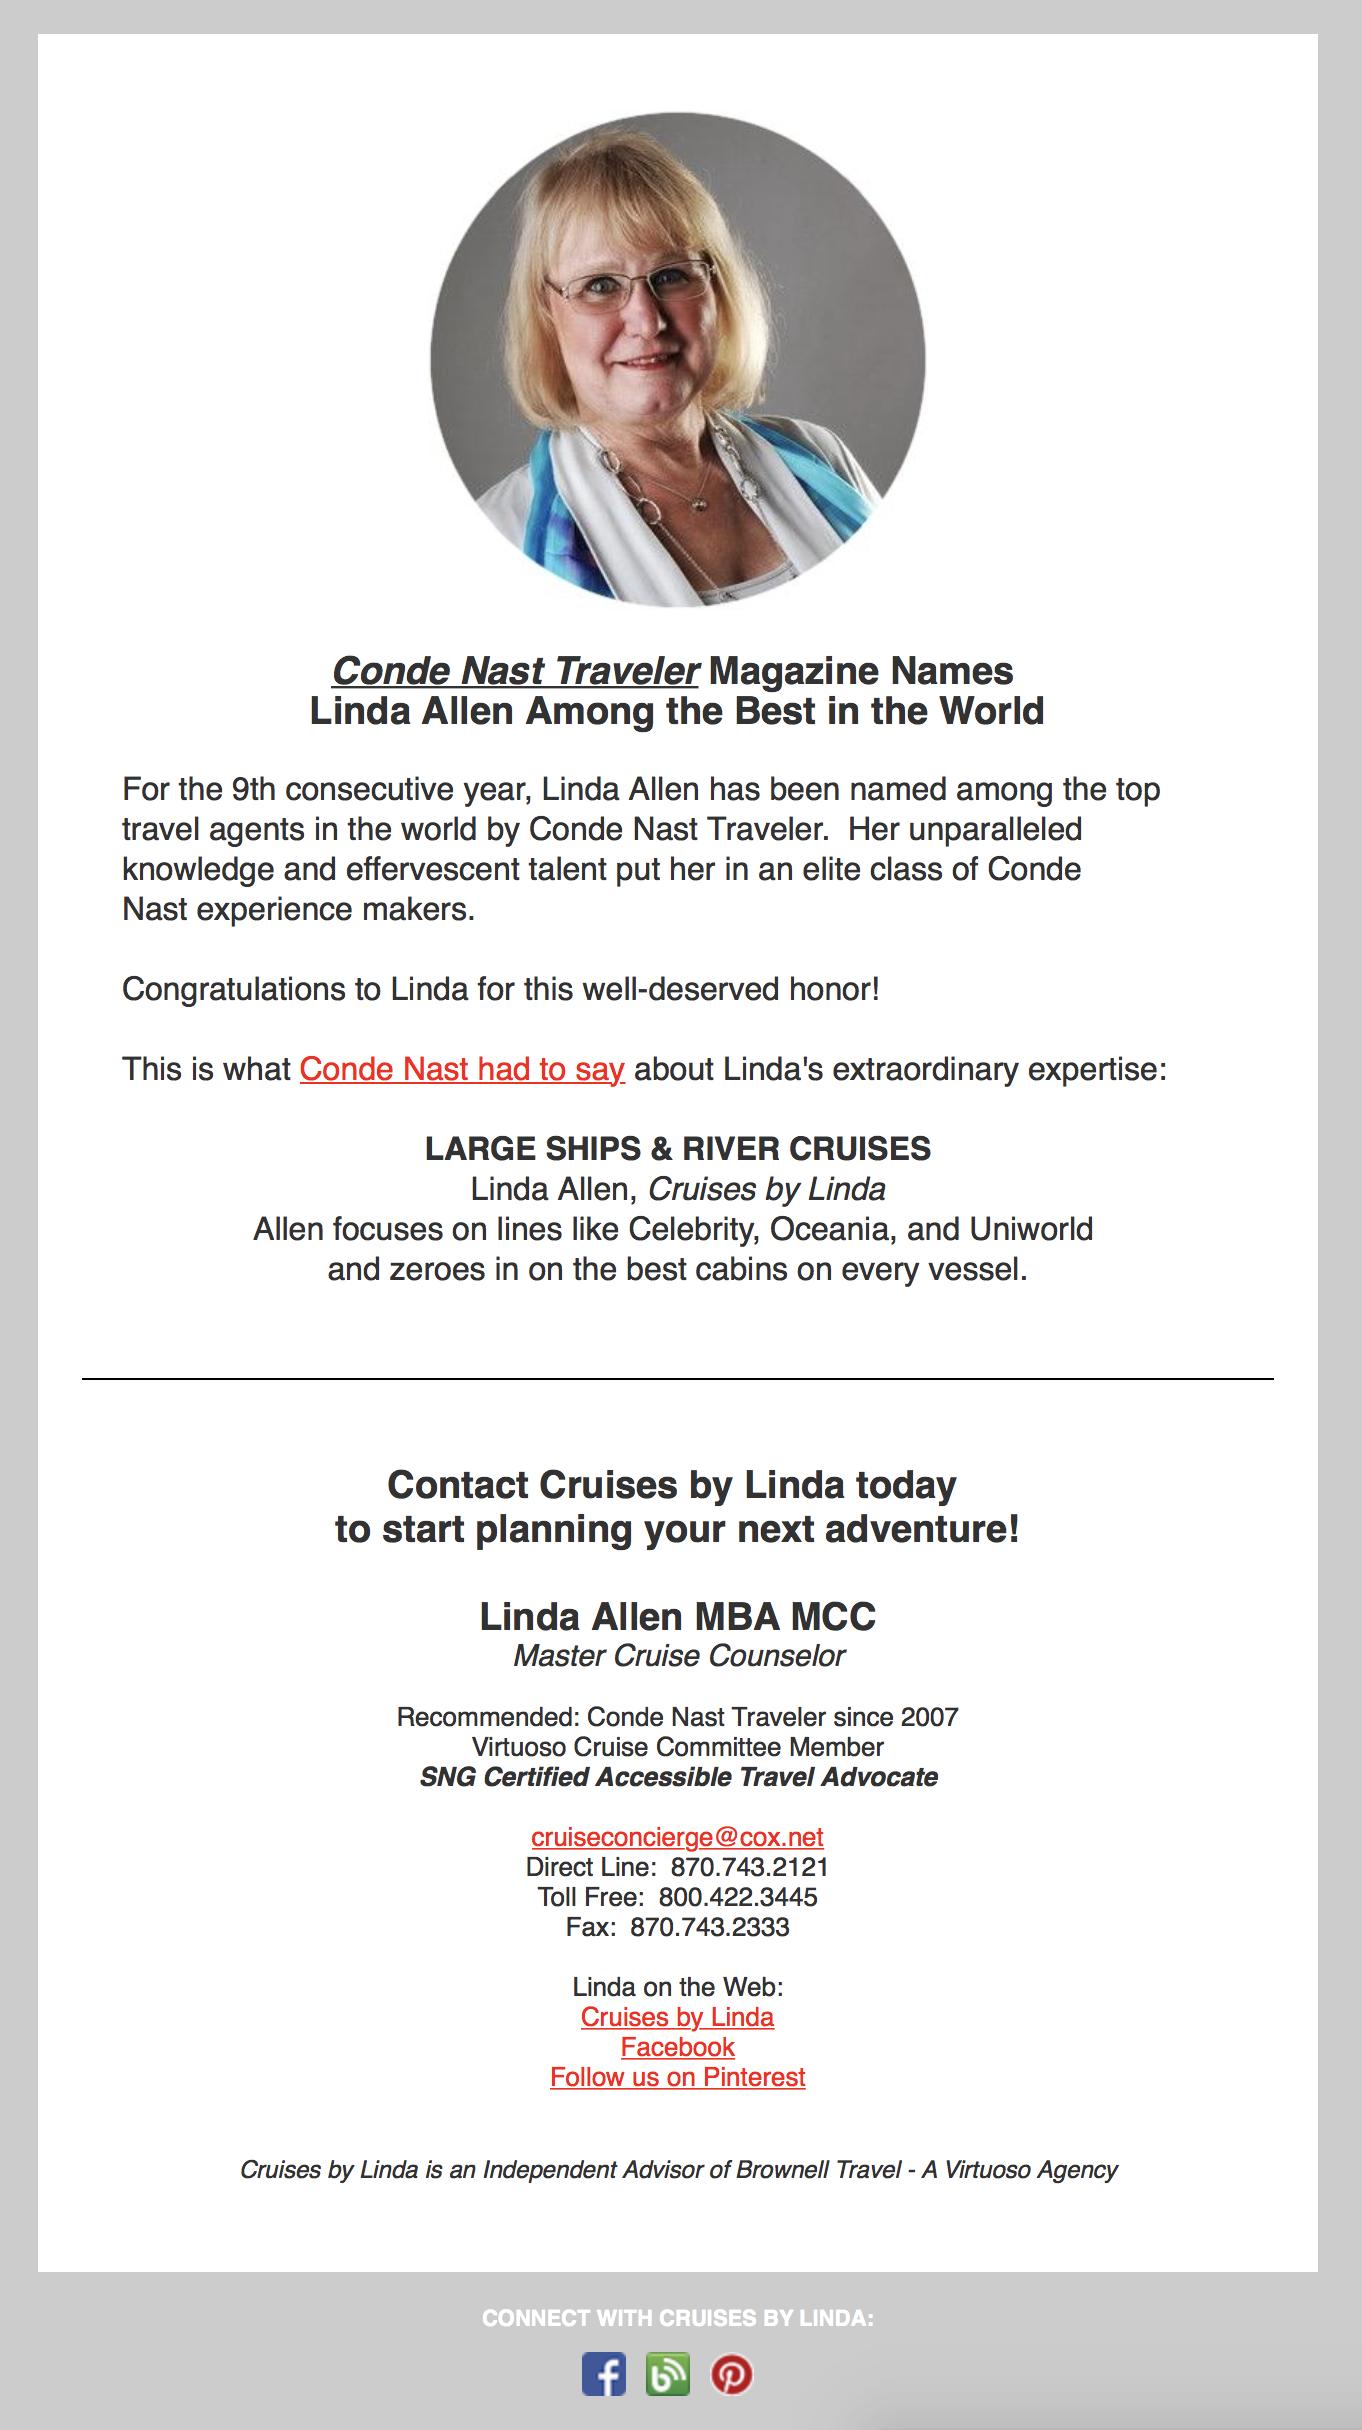 Linda Allen Conde Nast E-Blast